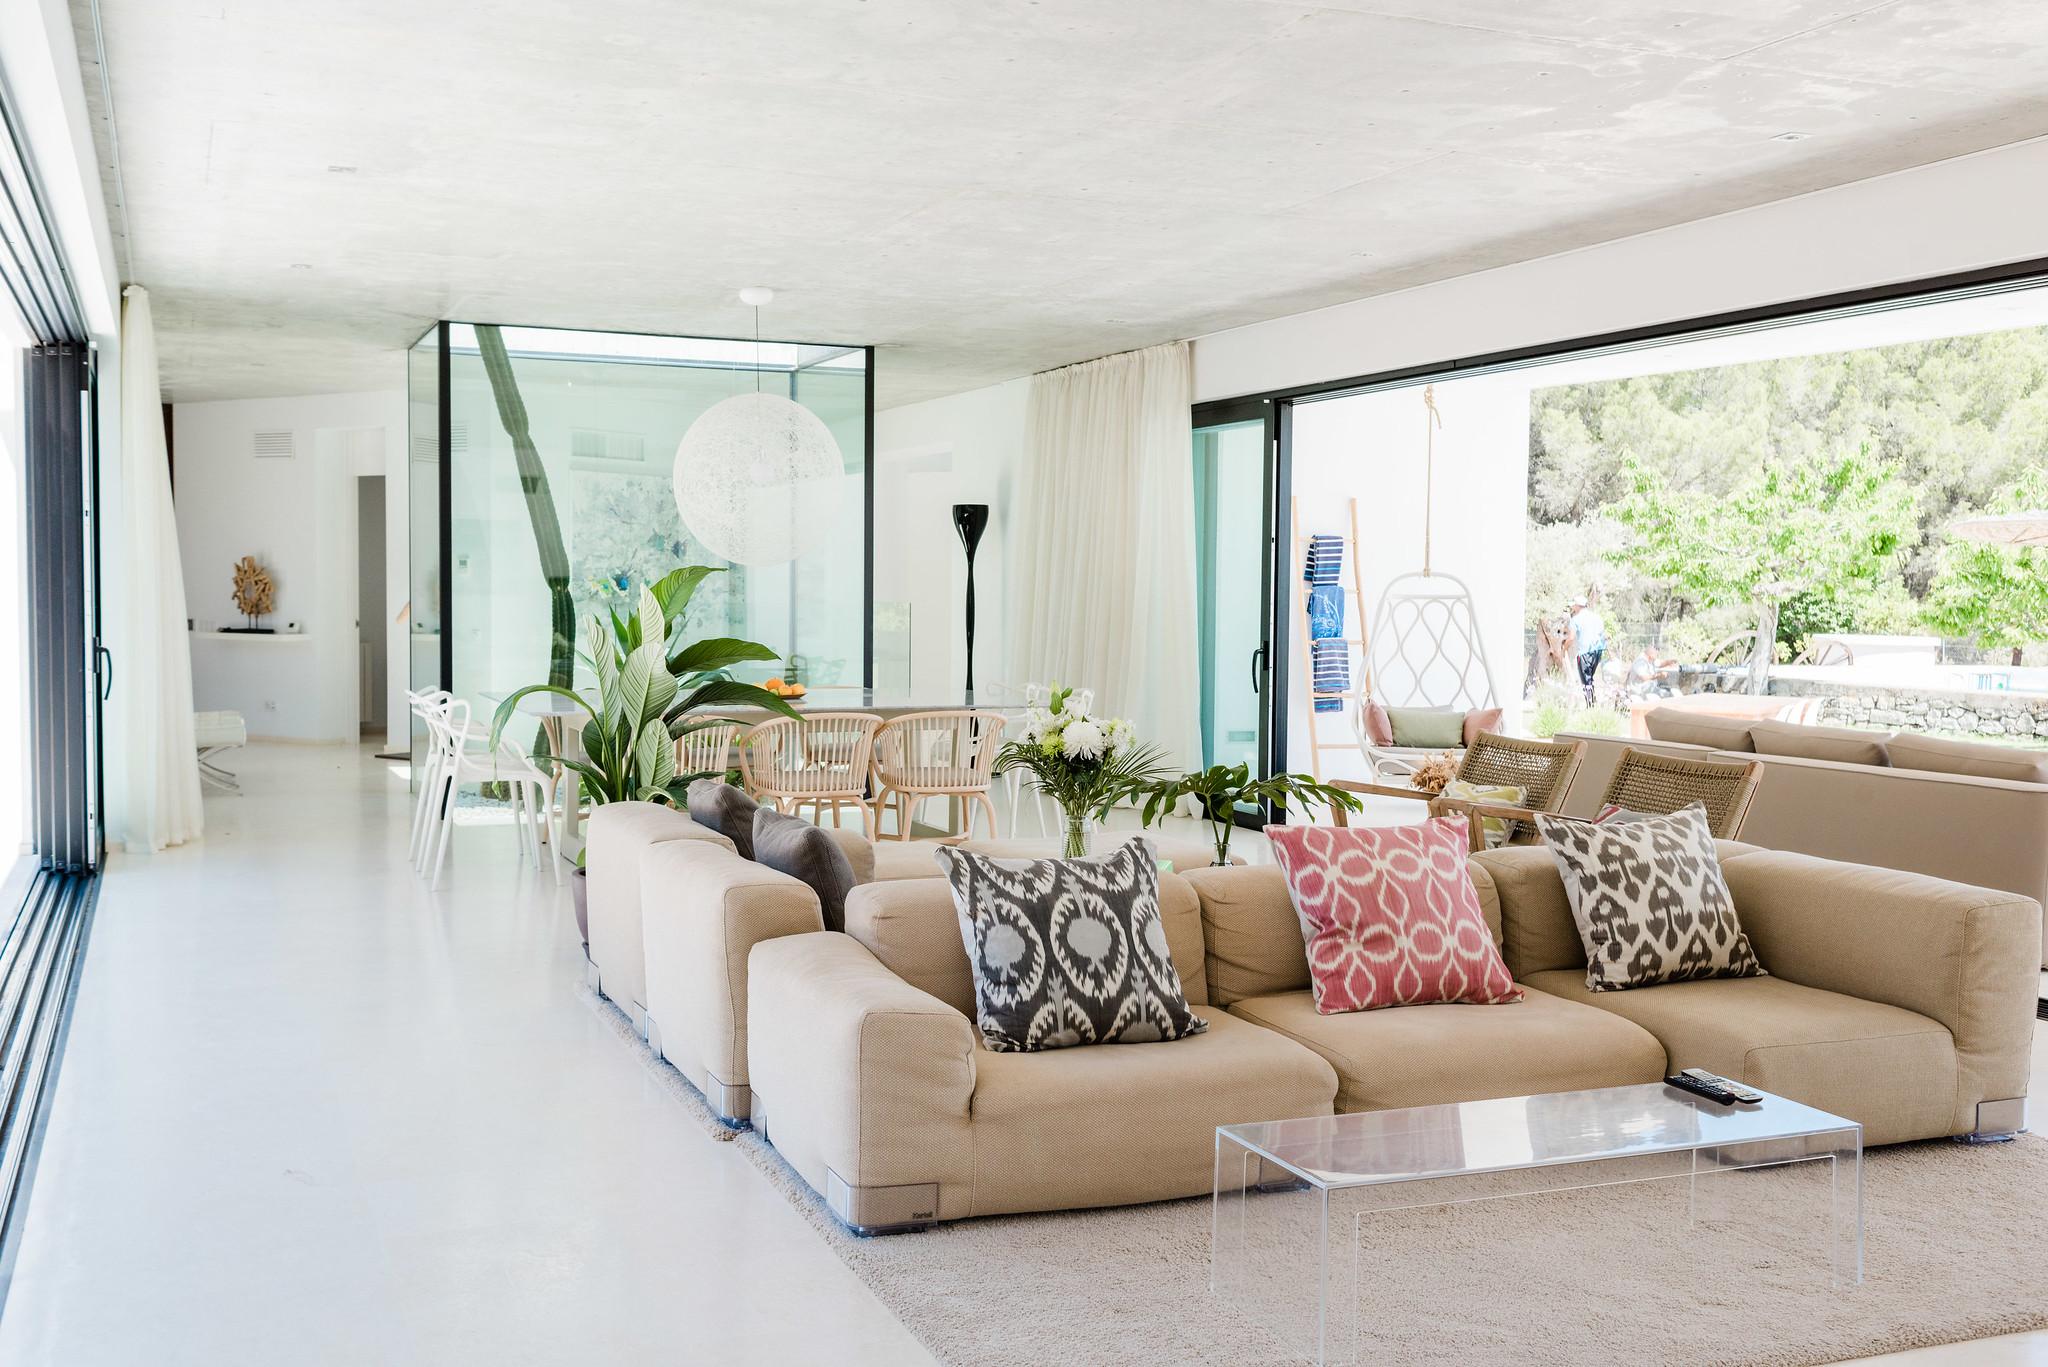 https://www.white-ibiza.com/wp-content/uploads/2020/06/white-ibiza-villas-can-carmen-interior-living-space2.jpg